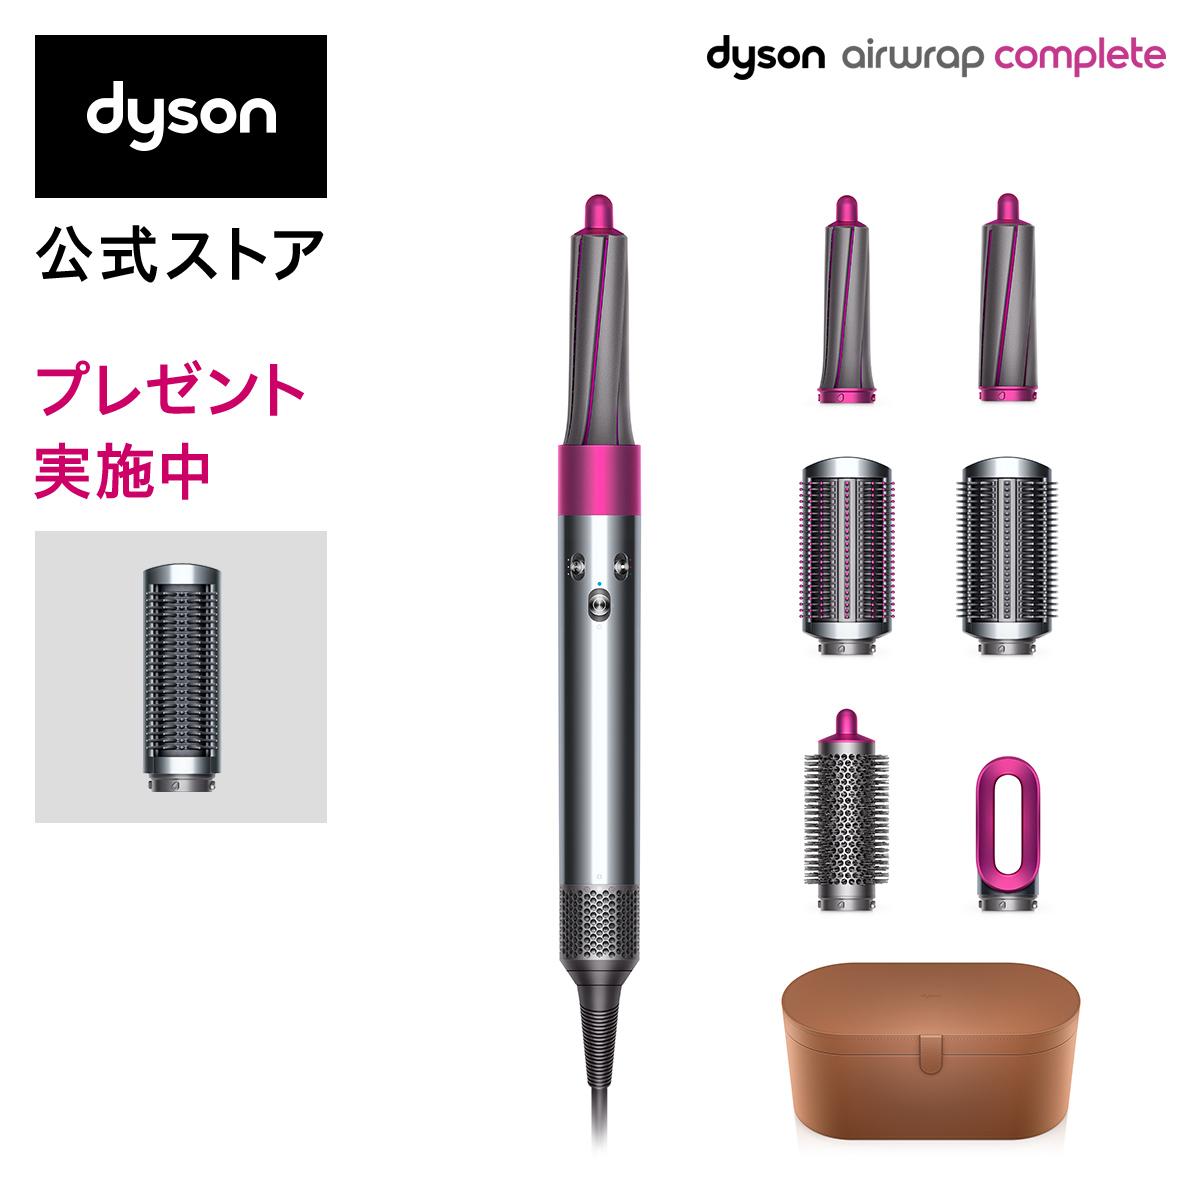 Dyson Airwrap Complete ダイソン エアラップ コンプリート HS01 フューシャ ニッケル メーカー公式 特別プレゼント付 マート FN COMP 2月1日より新価格